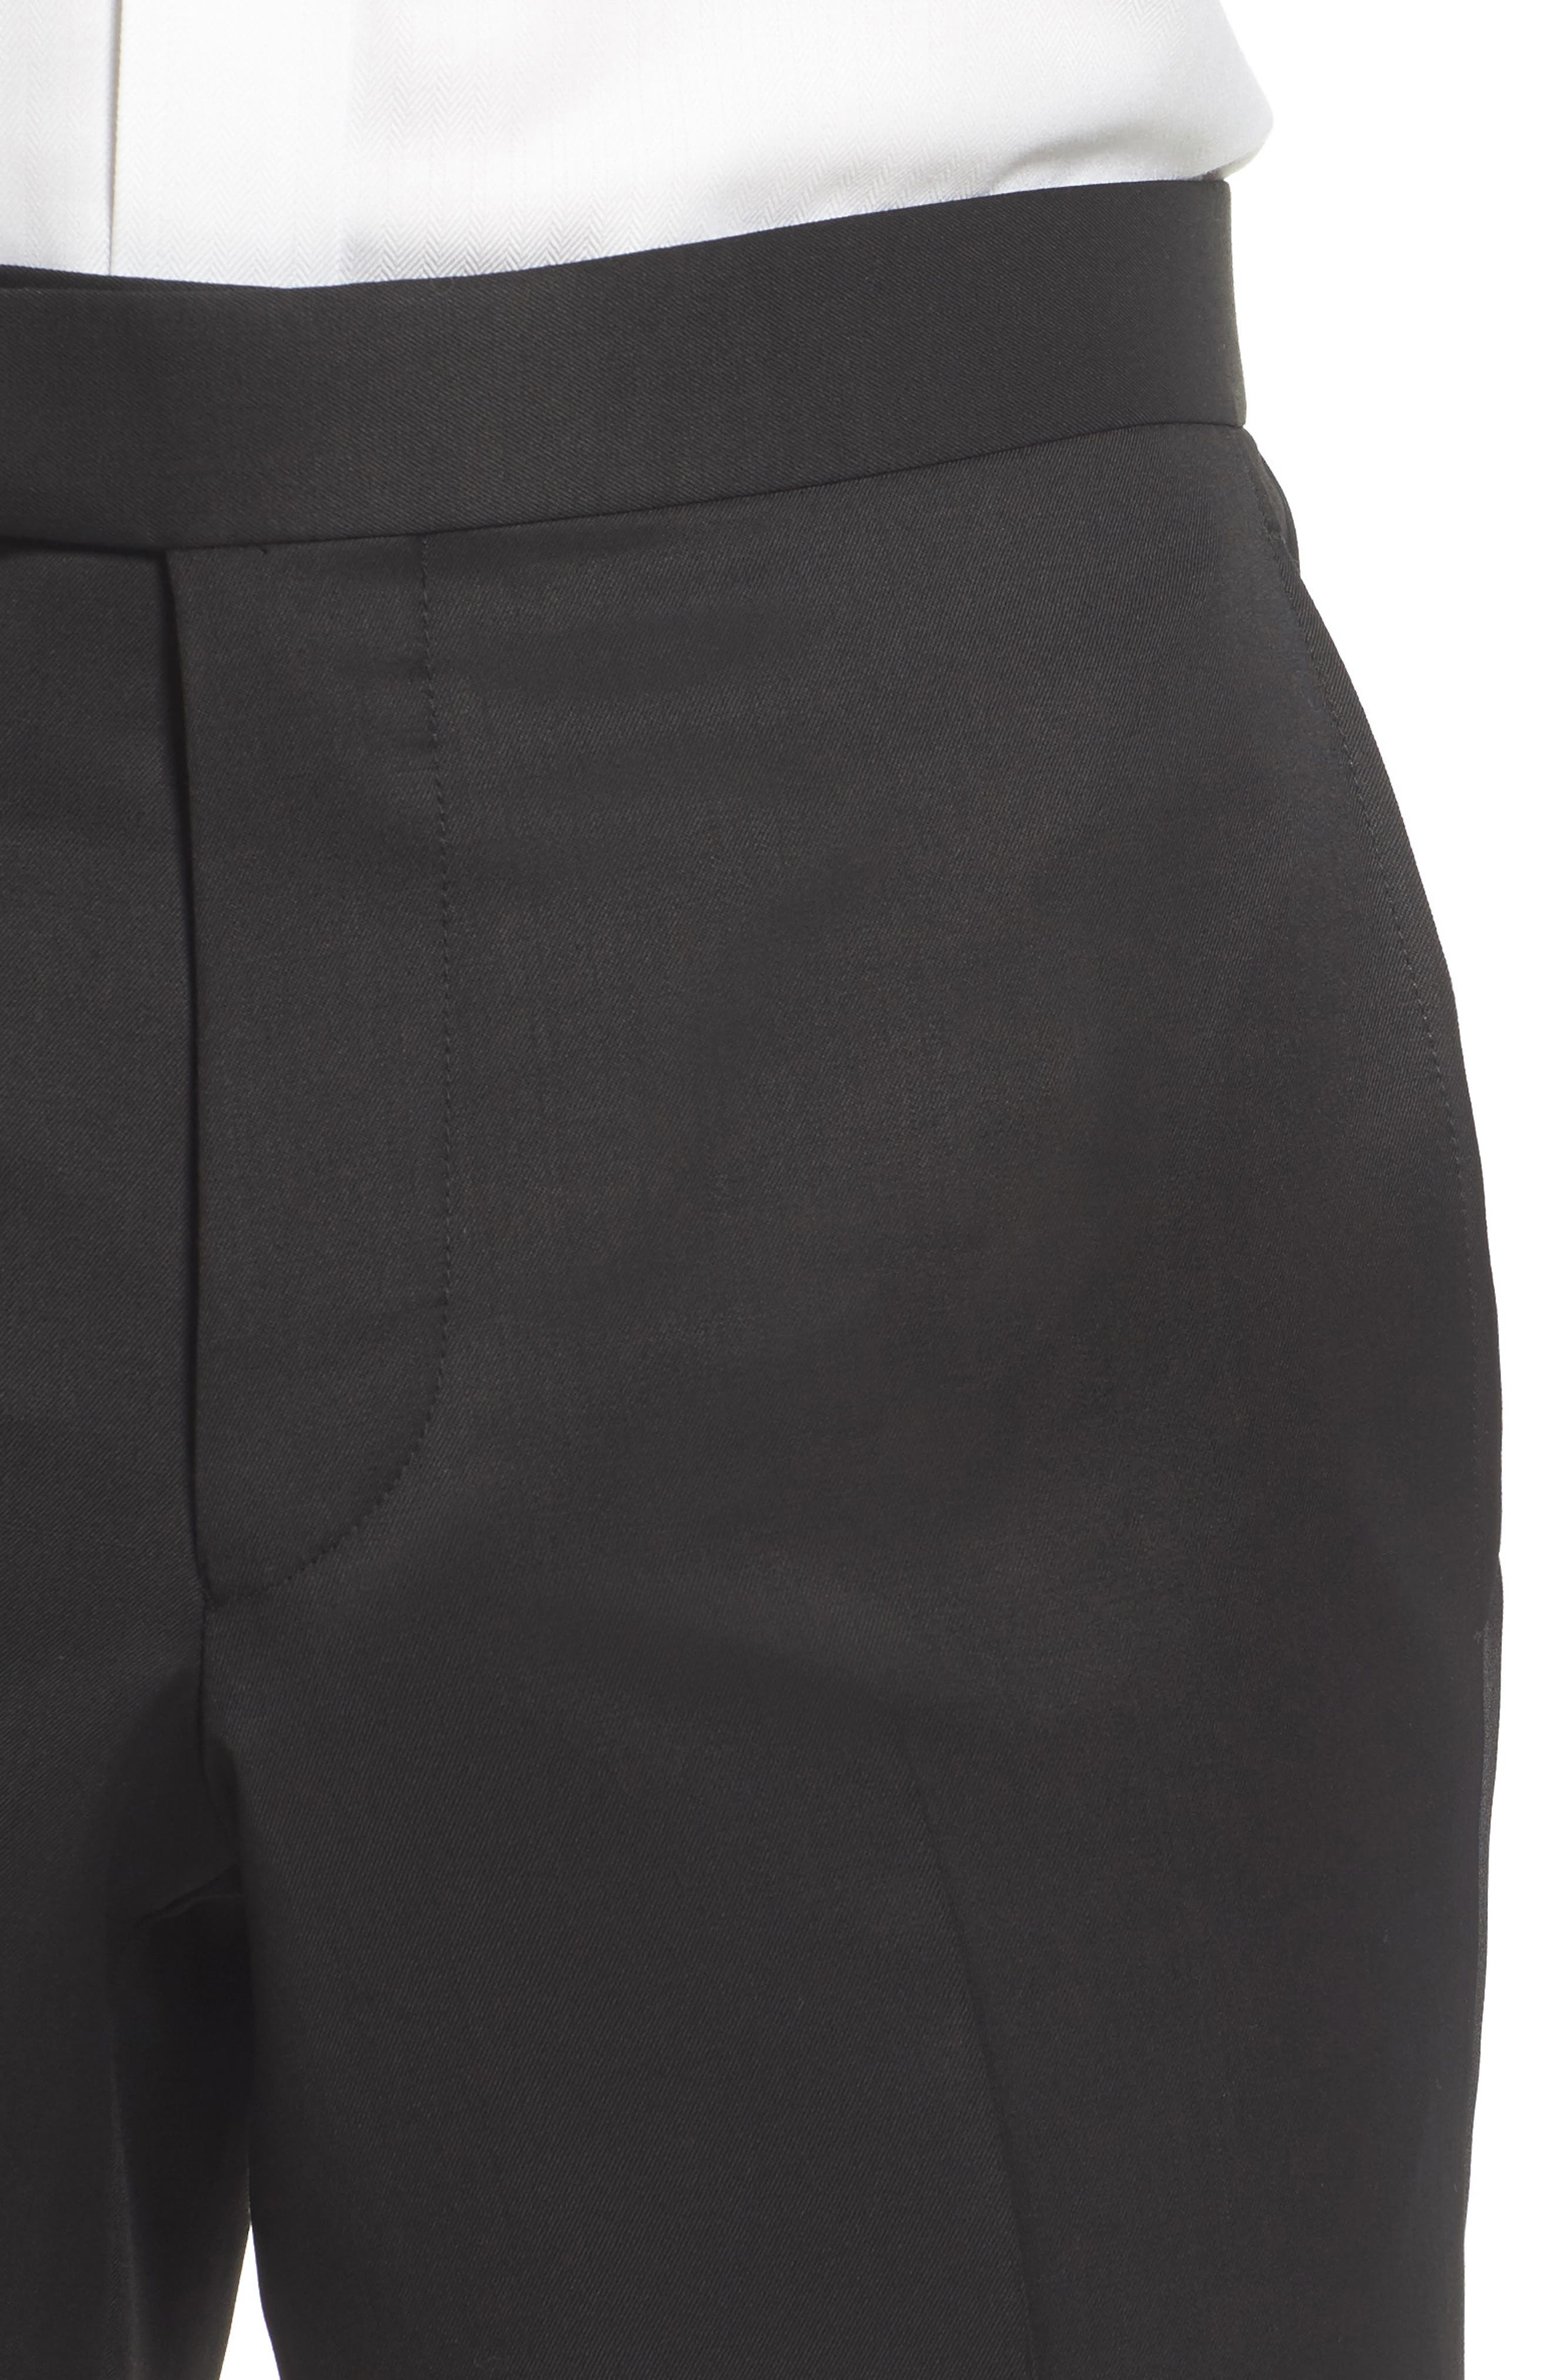 TED BAKER LONDON, Josh Flat Front Wool & Mohair Tuxedo Pants, Alternate thumbnail 5, color, BLACK